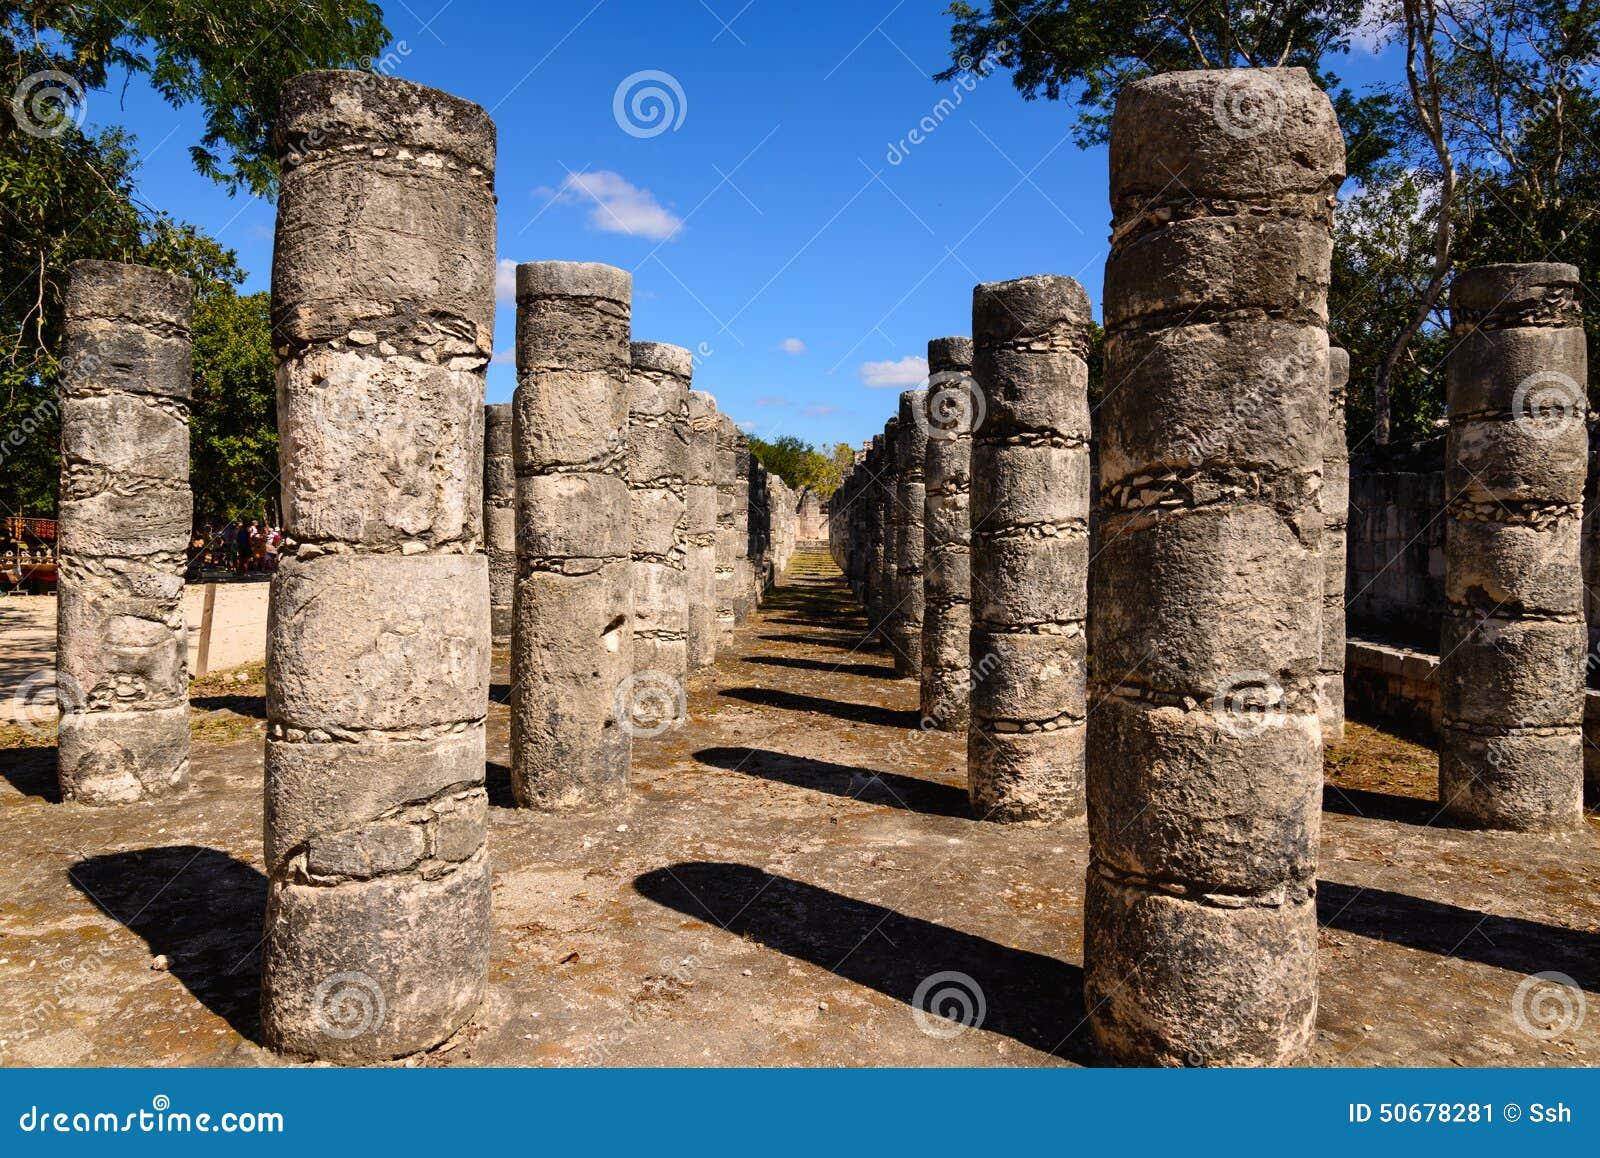 Download 墨西哥一千个专栏寺庙在尤加坦 库存图片. 图片 包括有 城市, 地标, 废墟, 寺庙, 透视图, 牺牲, 结构 - 50678281